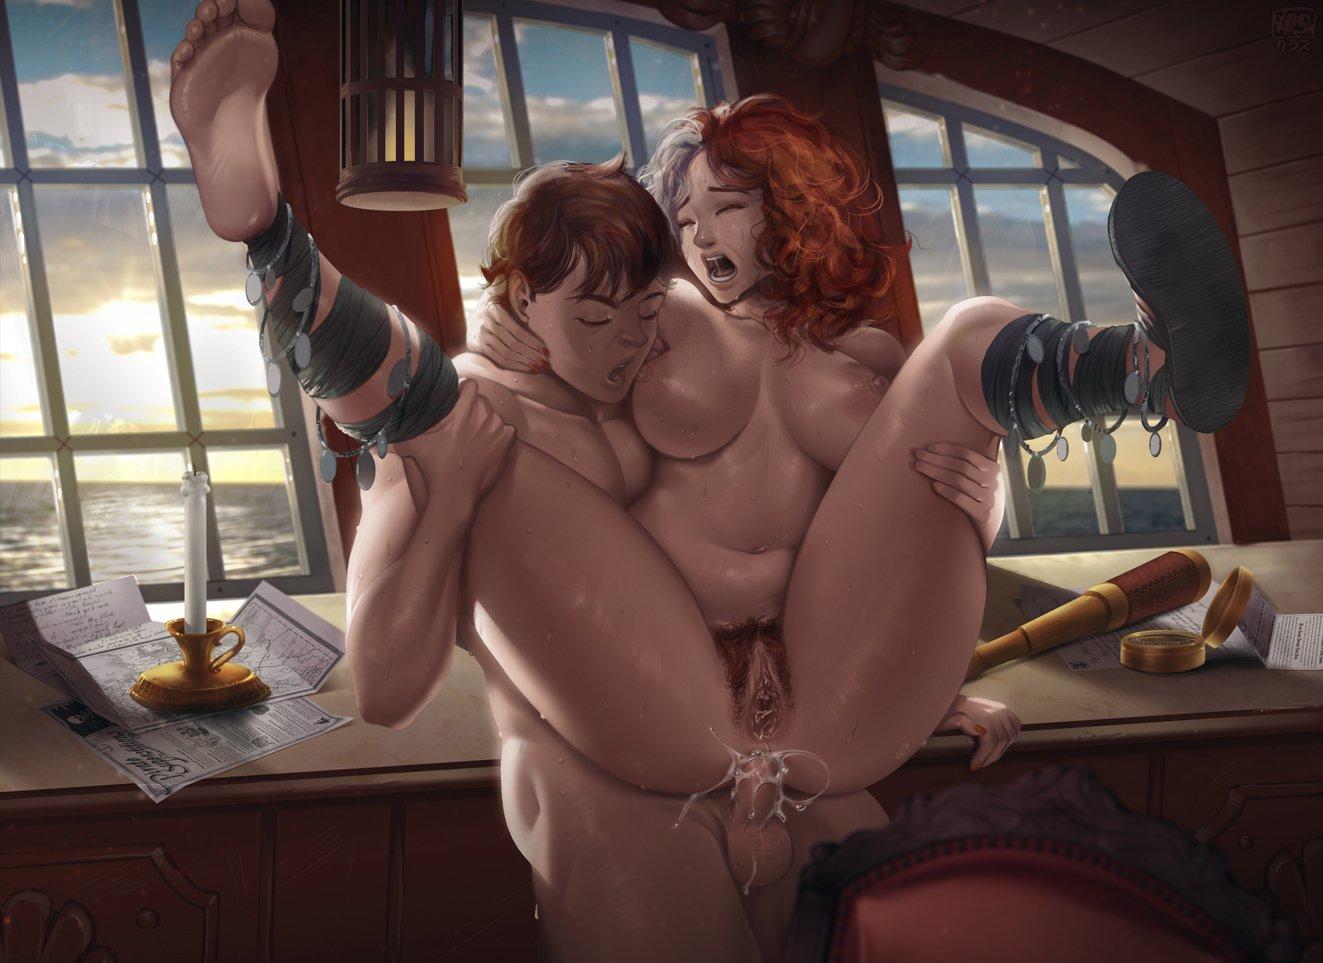 charmed divinity sin orc original To love ru yami nude